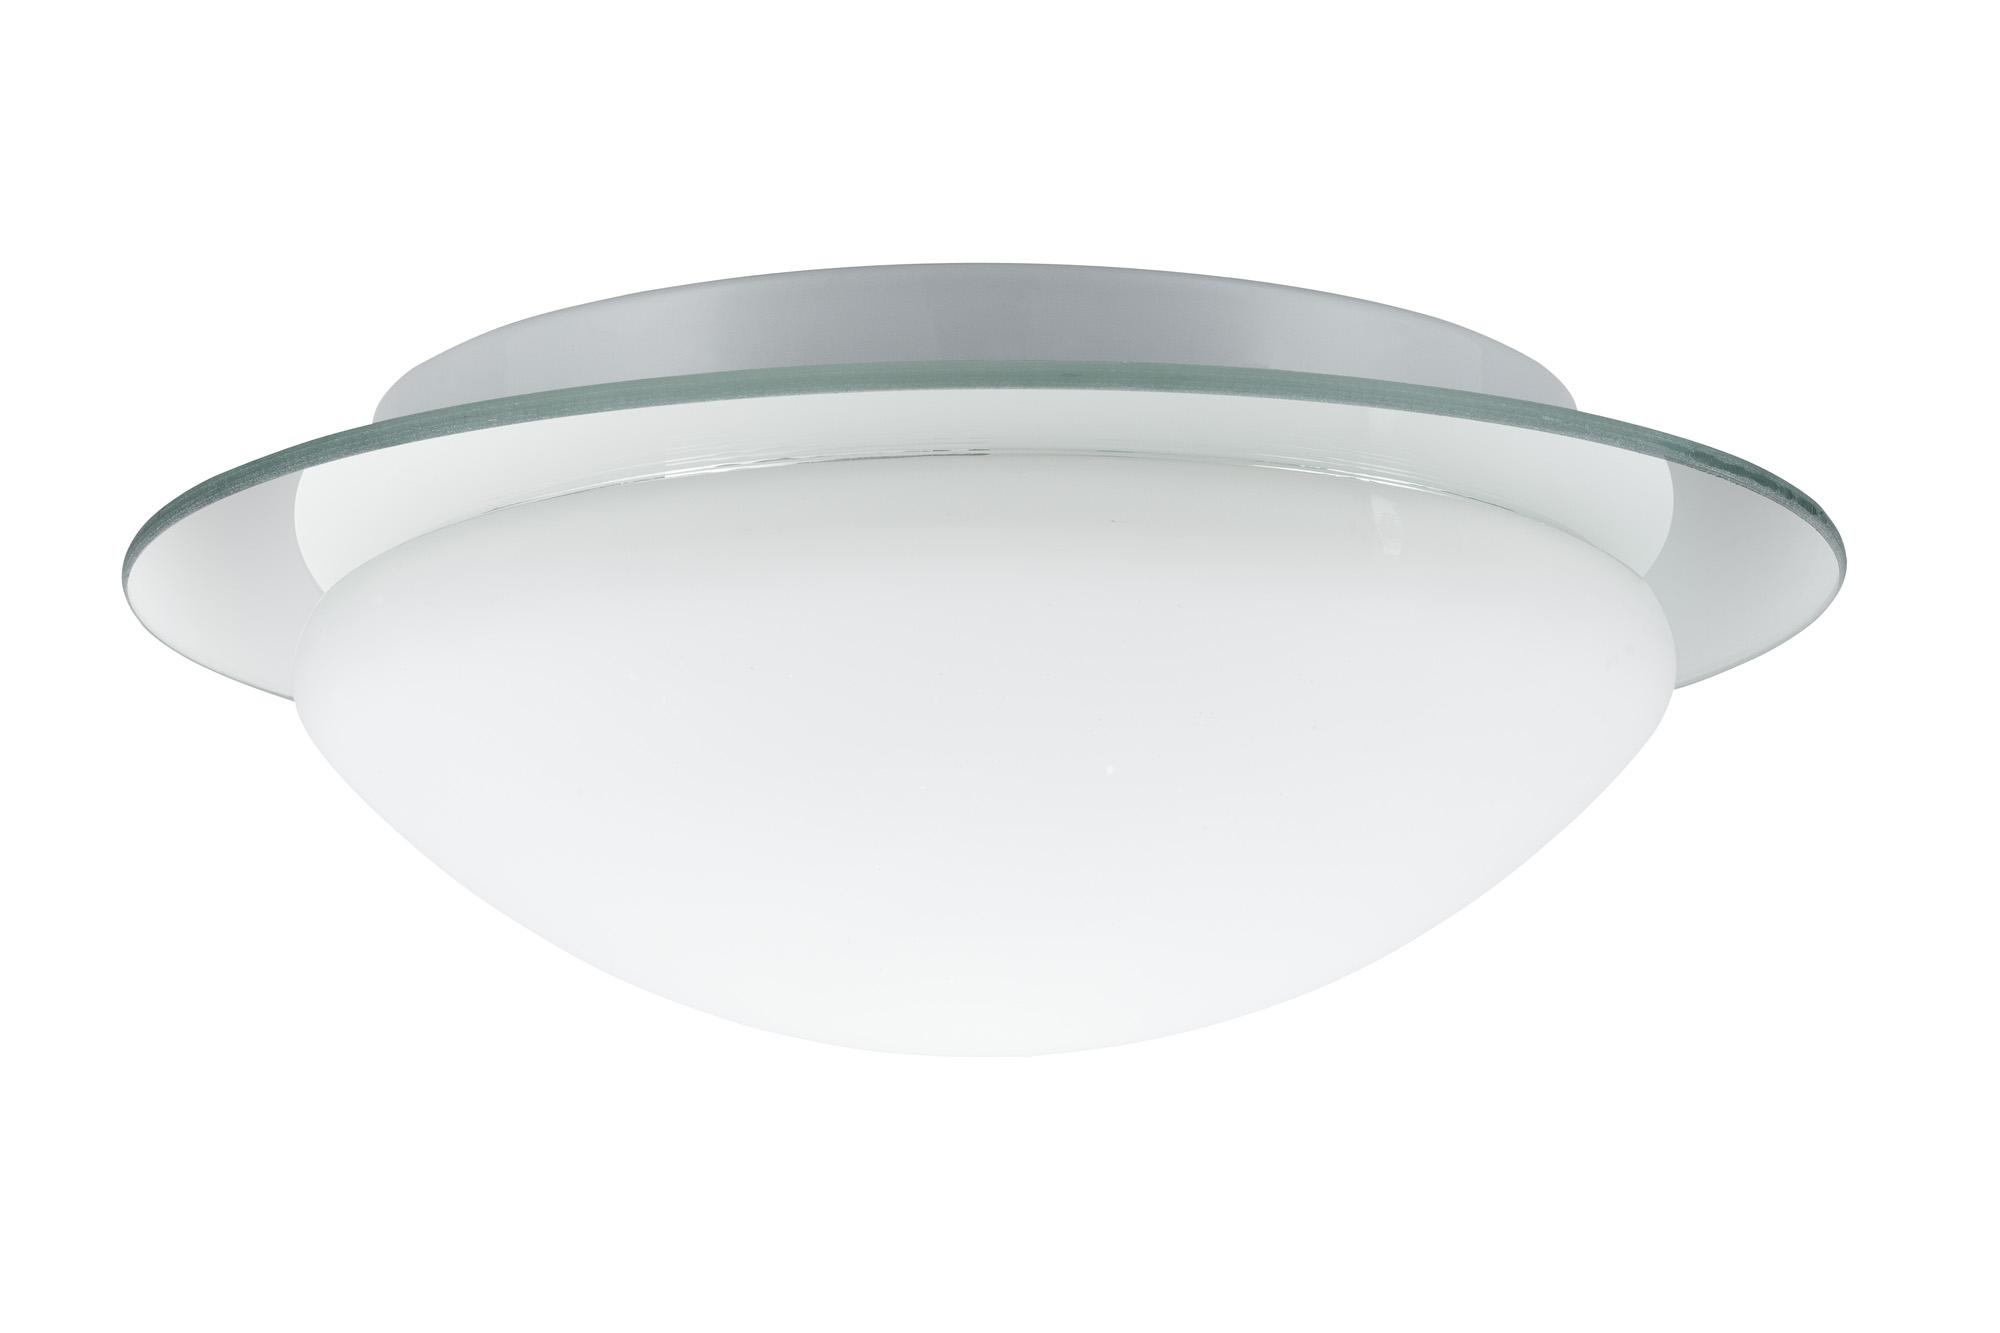 Plafonnier salle de bain paulmann mirfak ip44 max 40w 230v for Luminaire encastrable salle de bain